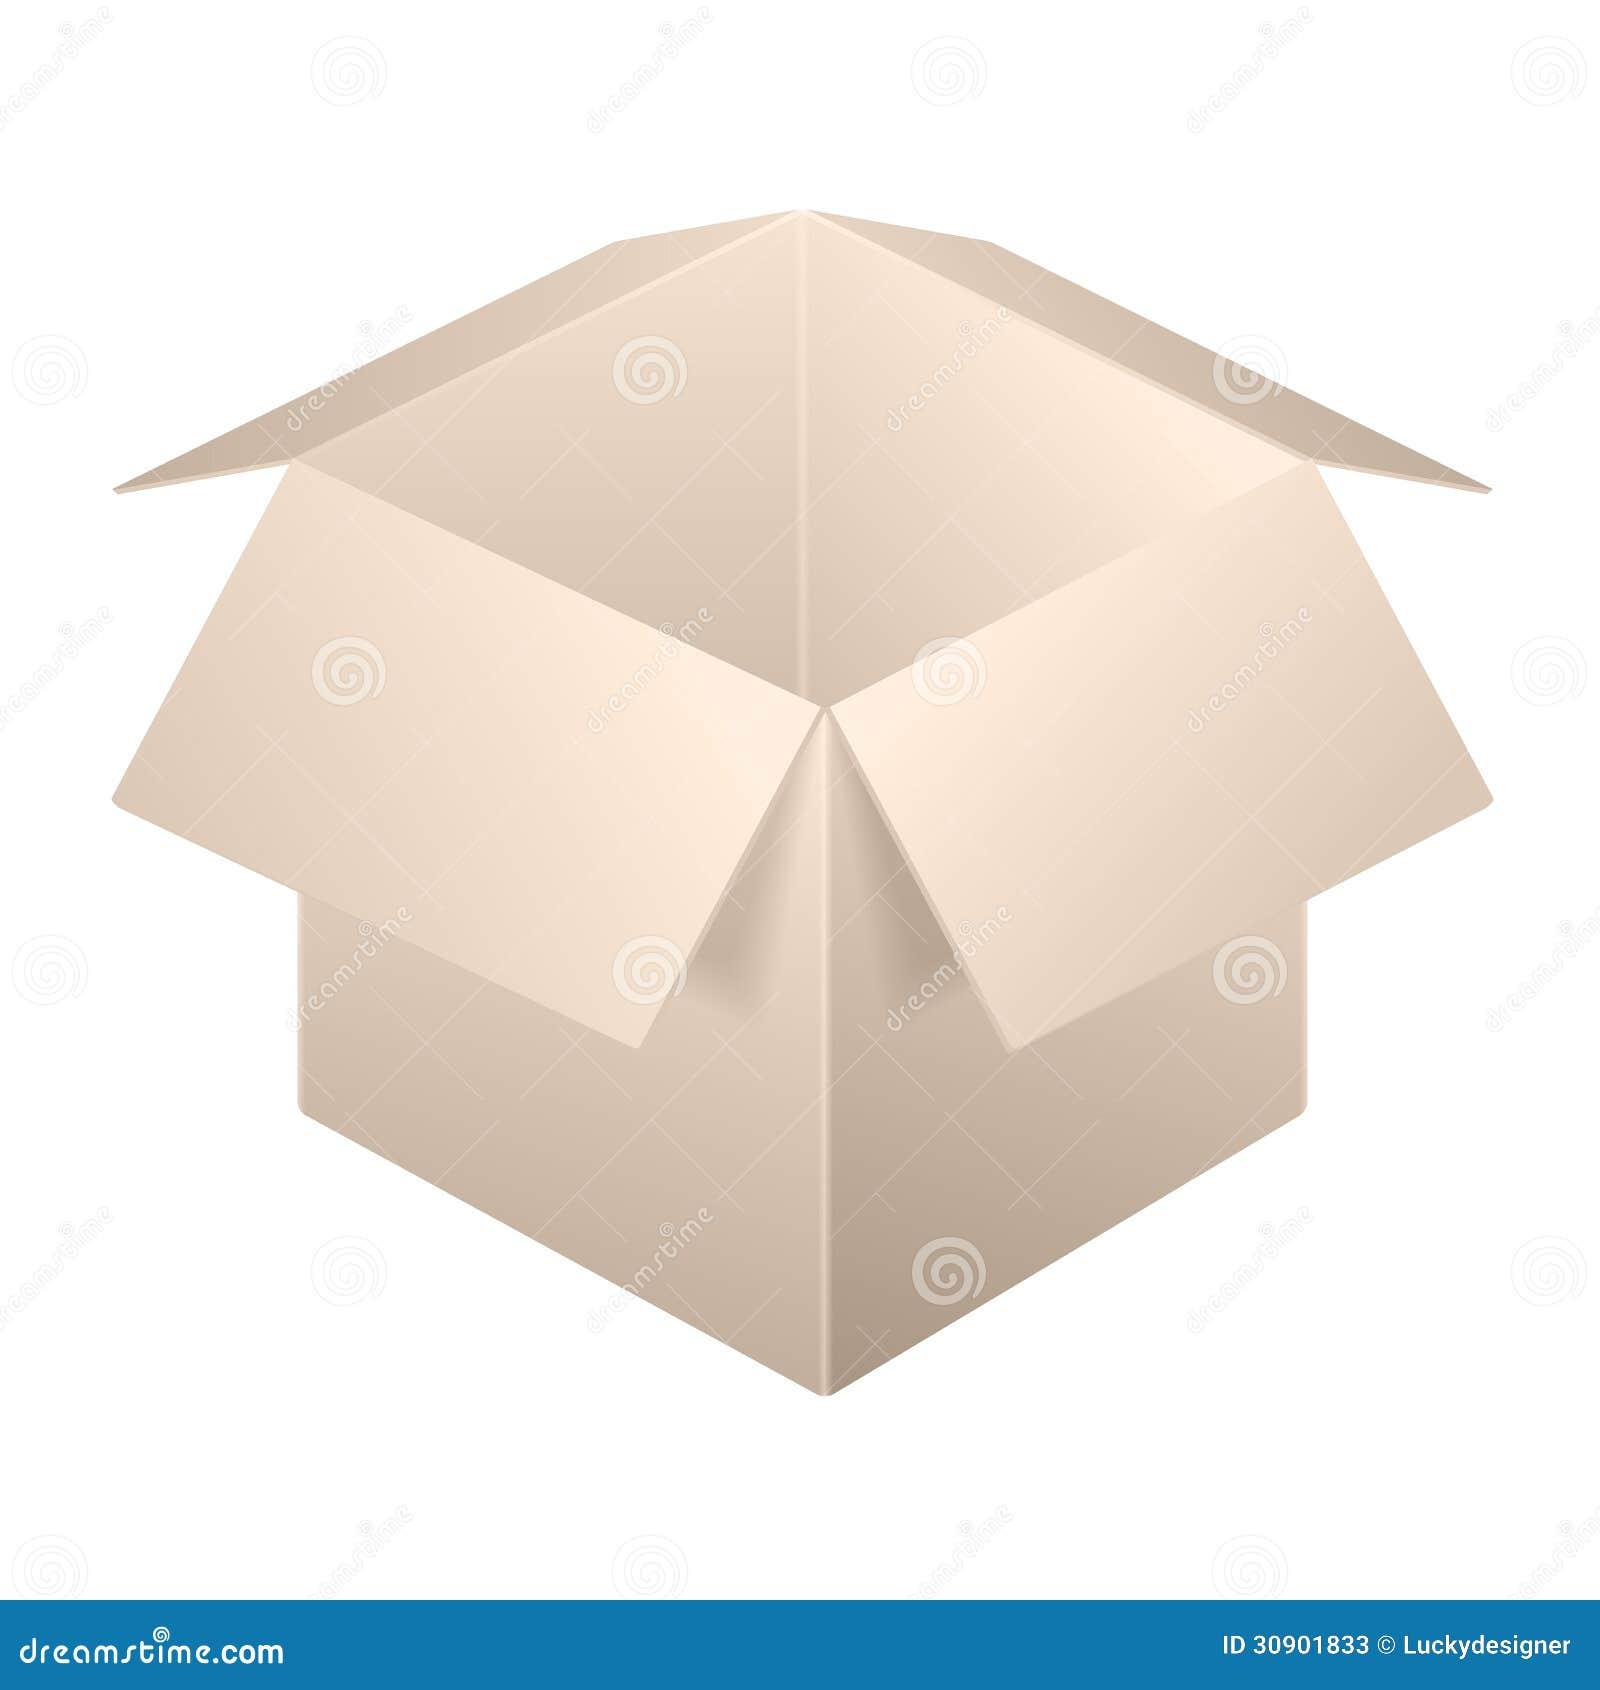 brown open box icon template stock vector illustration 30901833. Black Bedroom Furniture Sets. Home Design Ideas